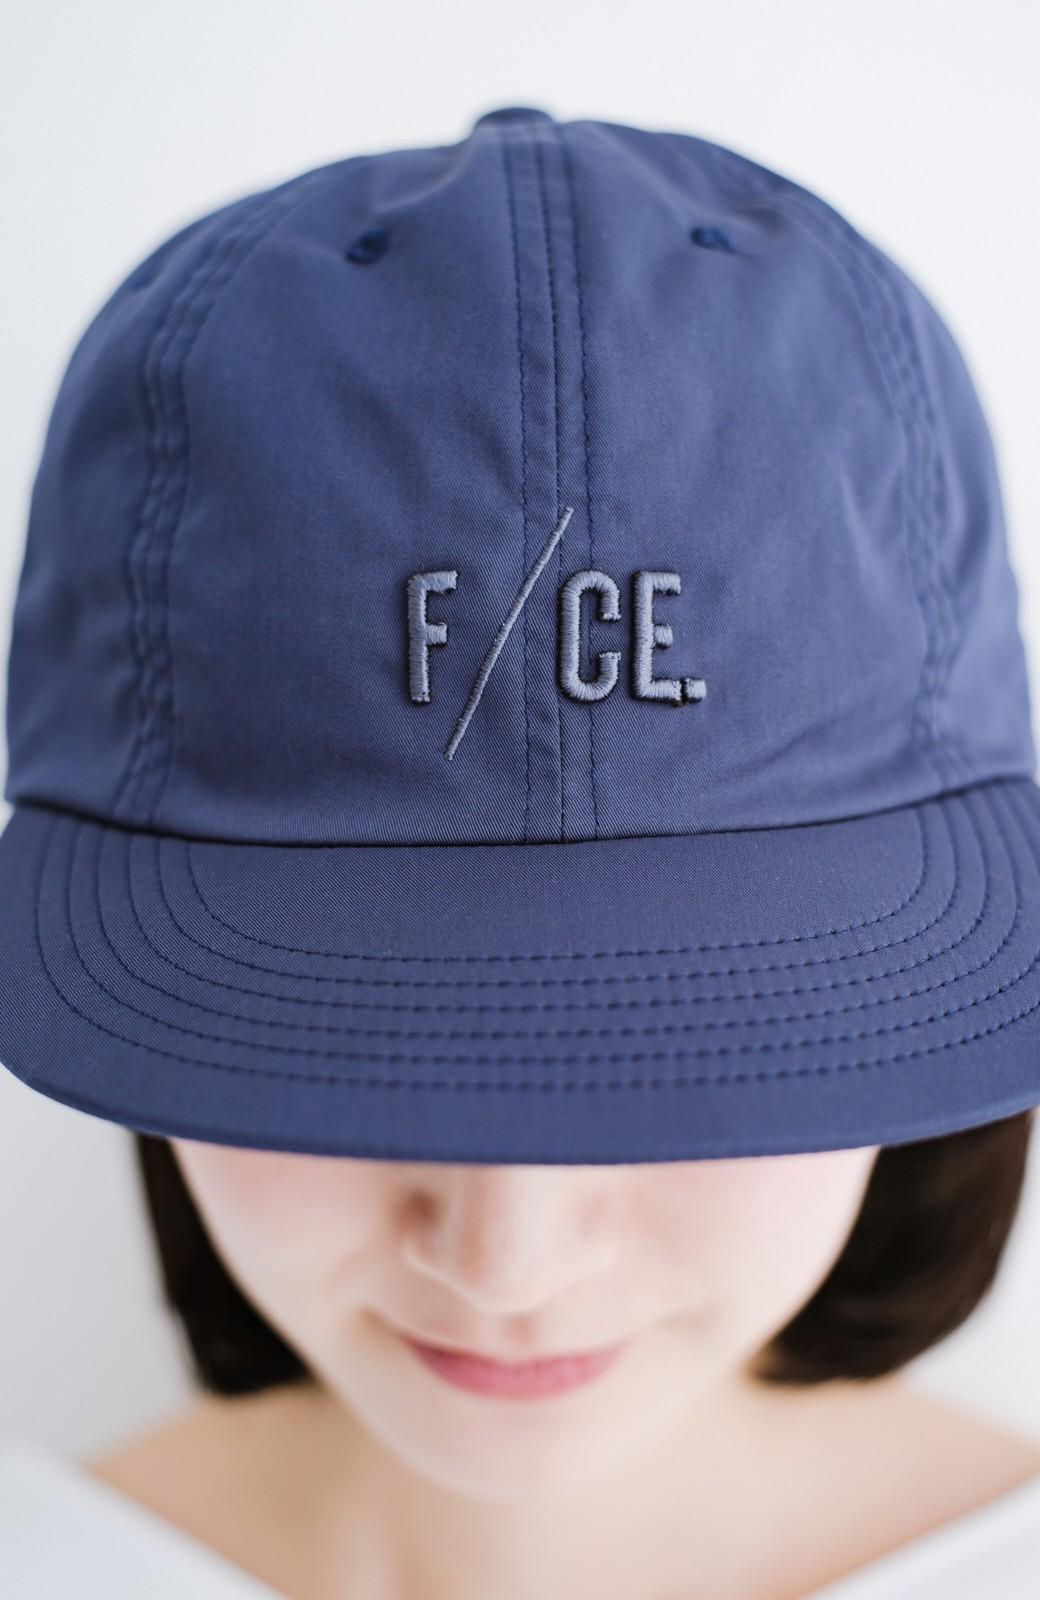 haco! F/CE. (エフシーイー)8 PANNEL CAP <ネイビー>の商品写真4